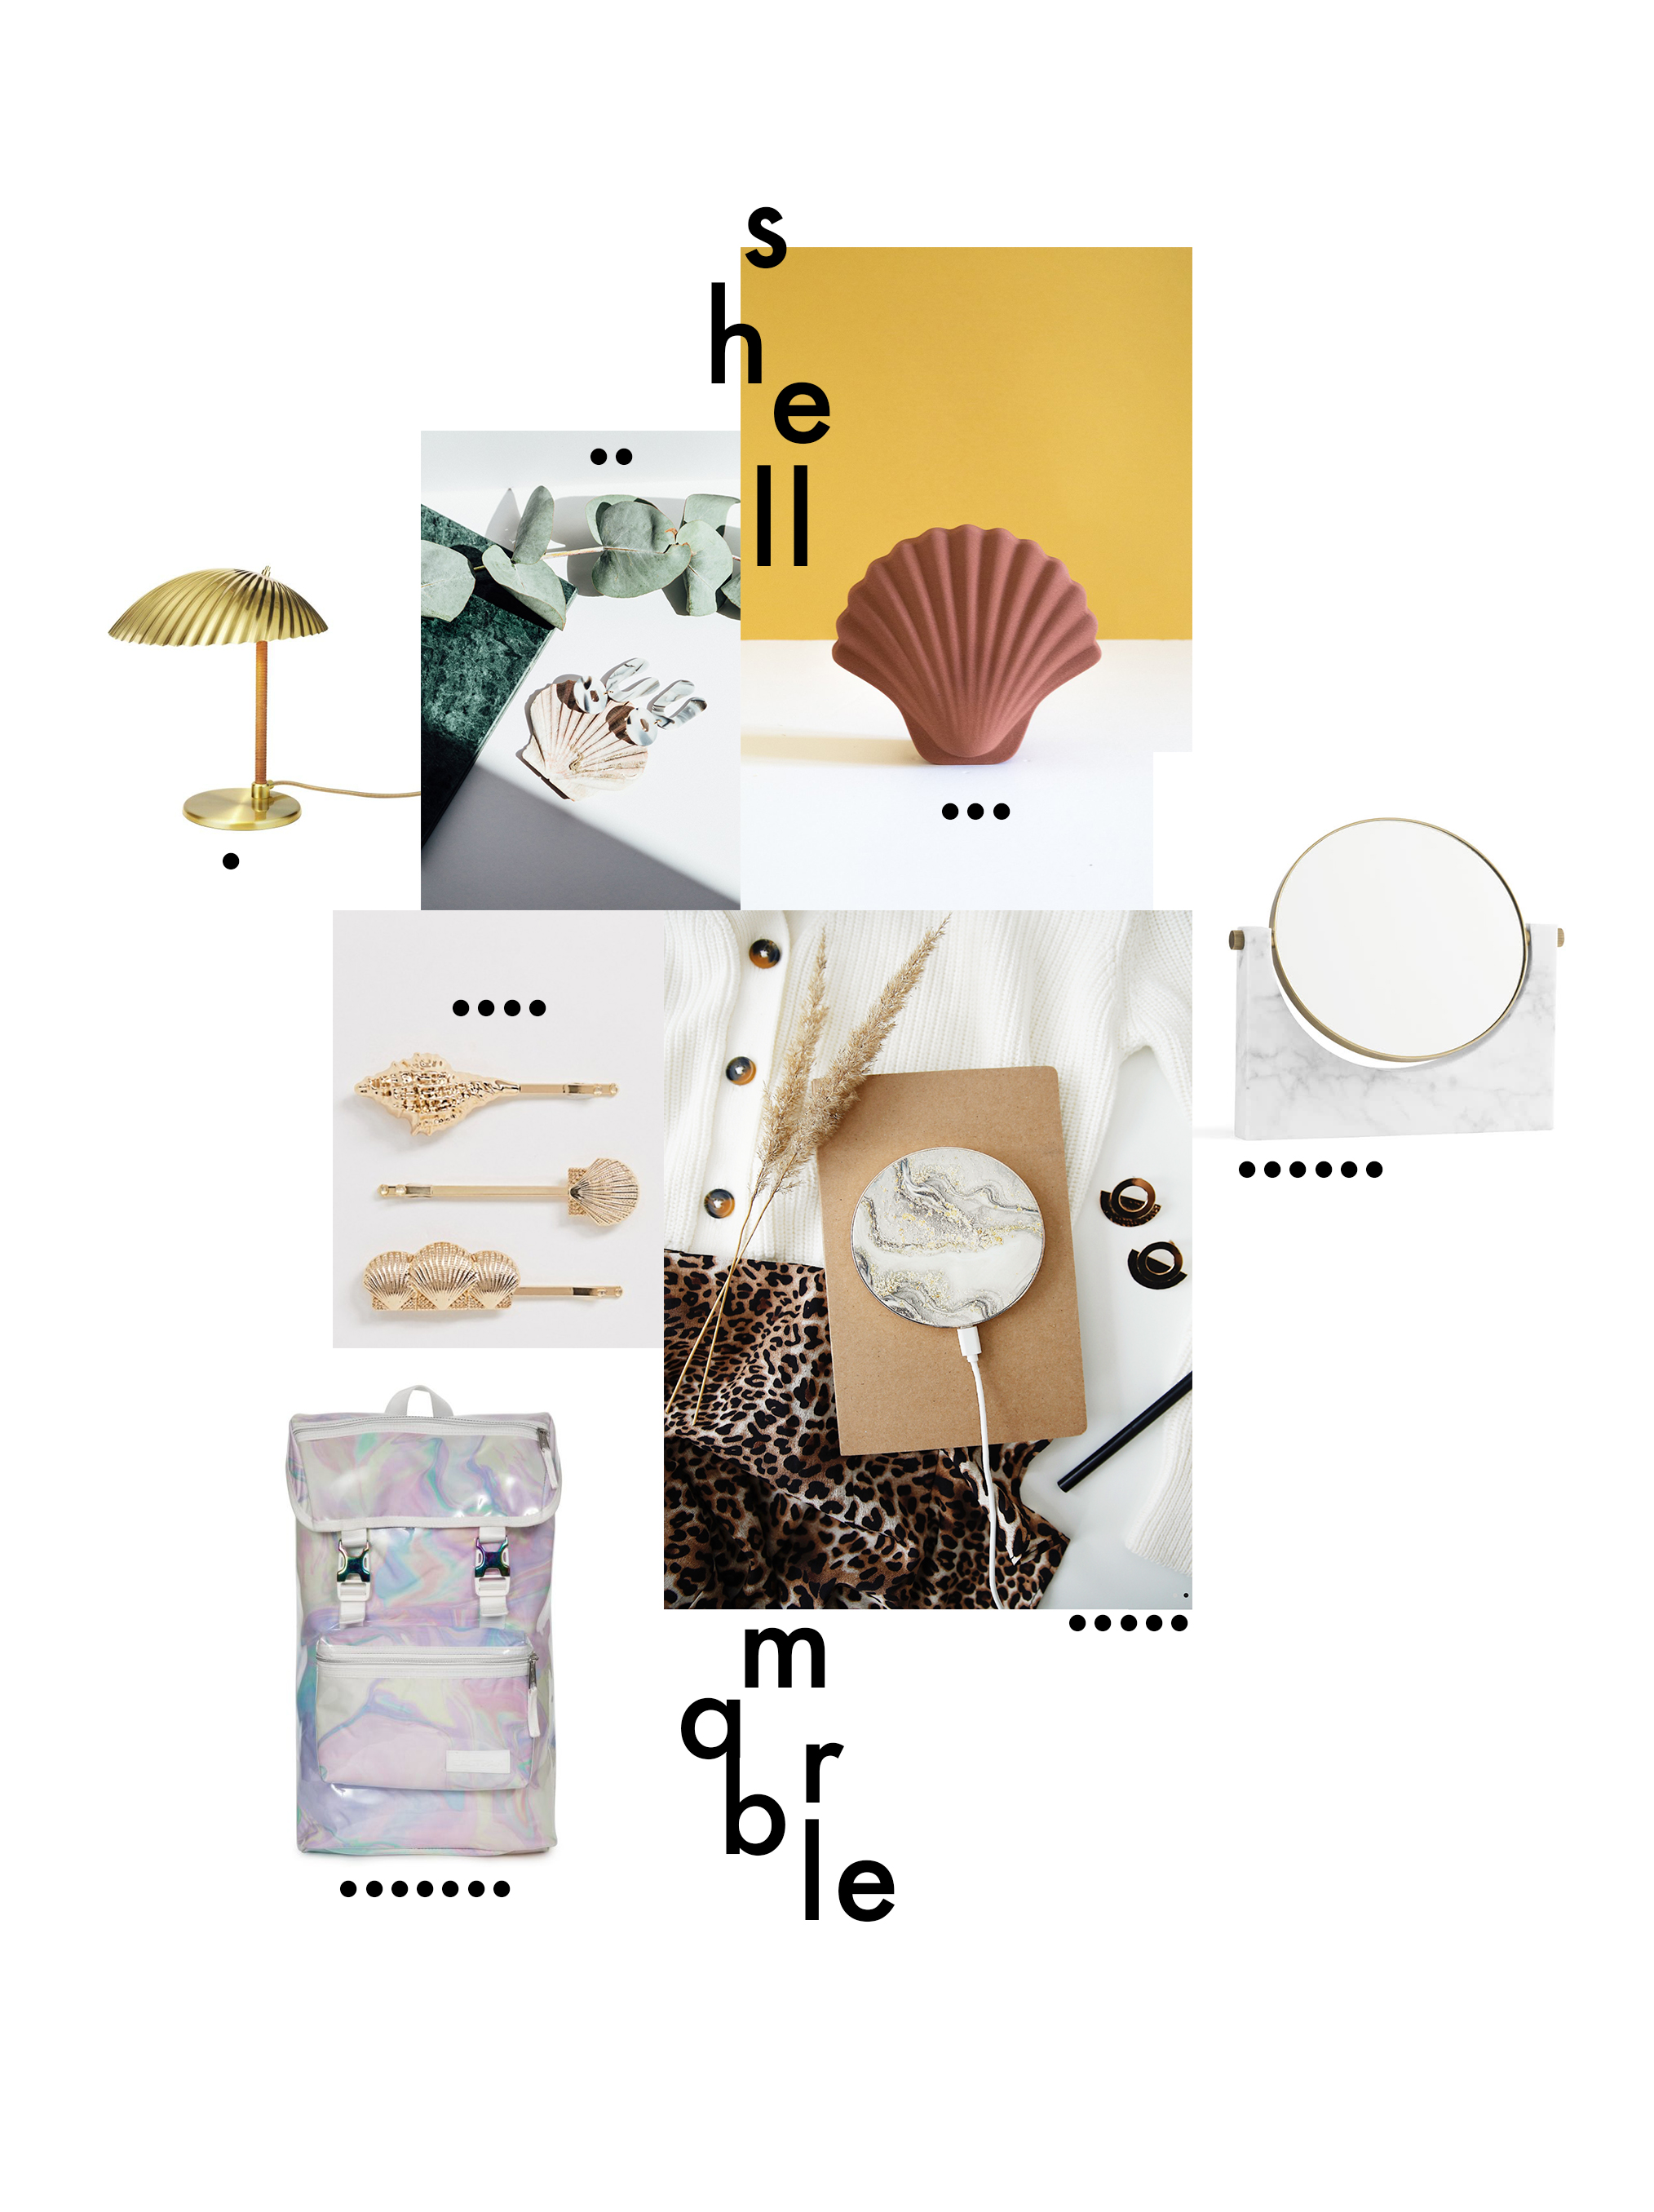 Seashell Vibes x Marblemania